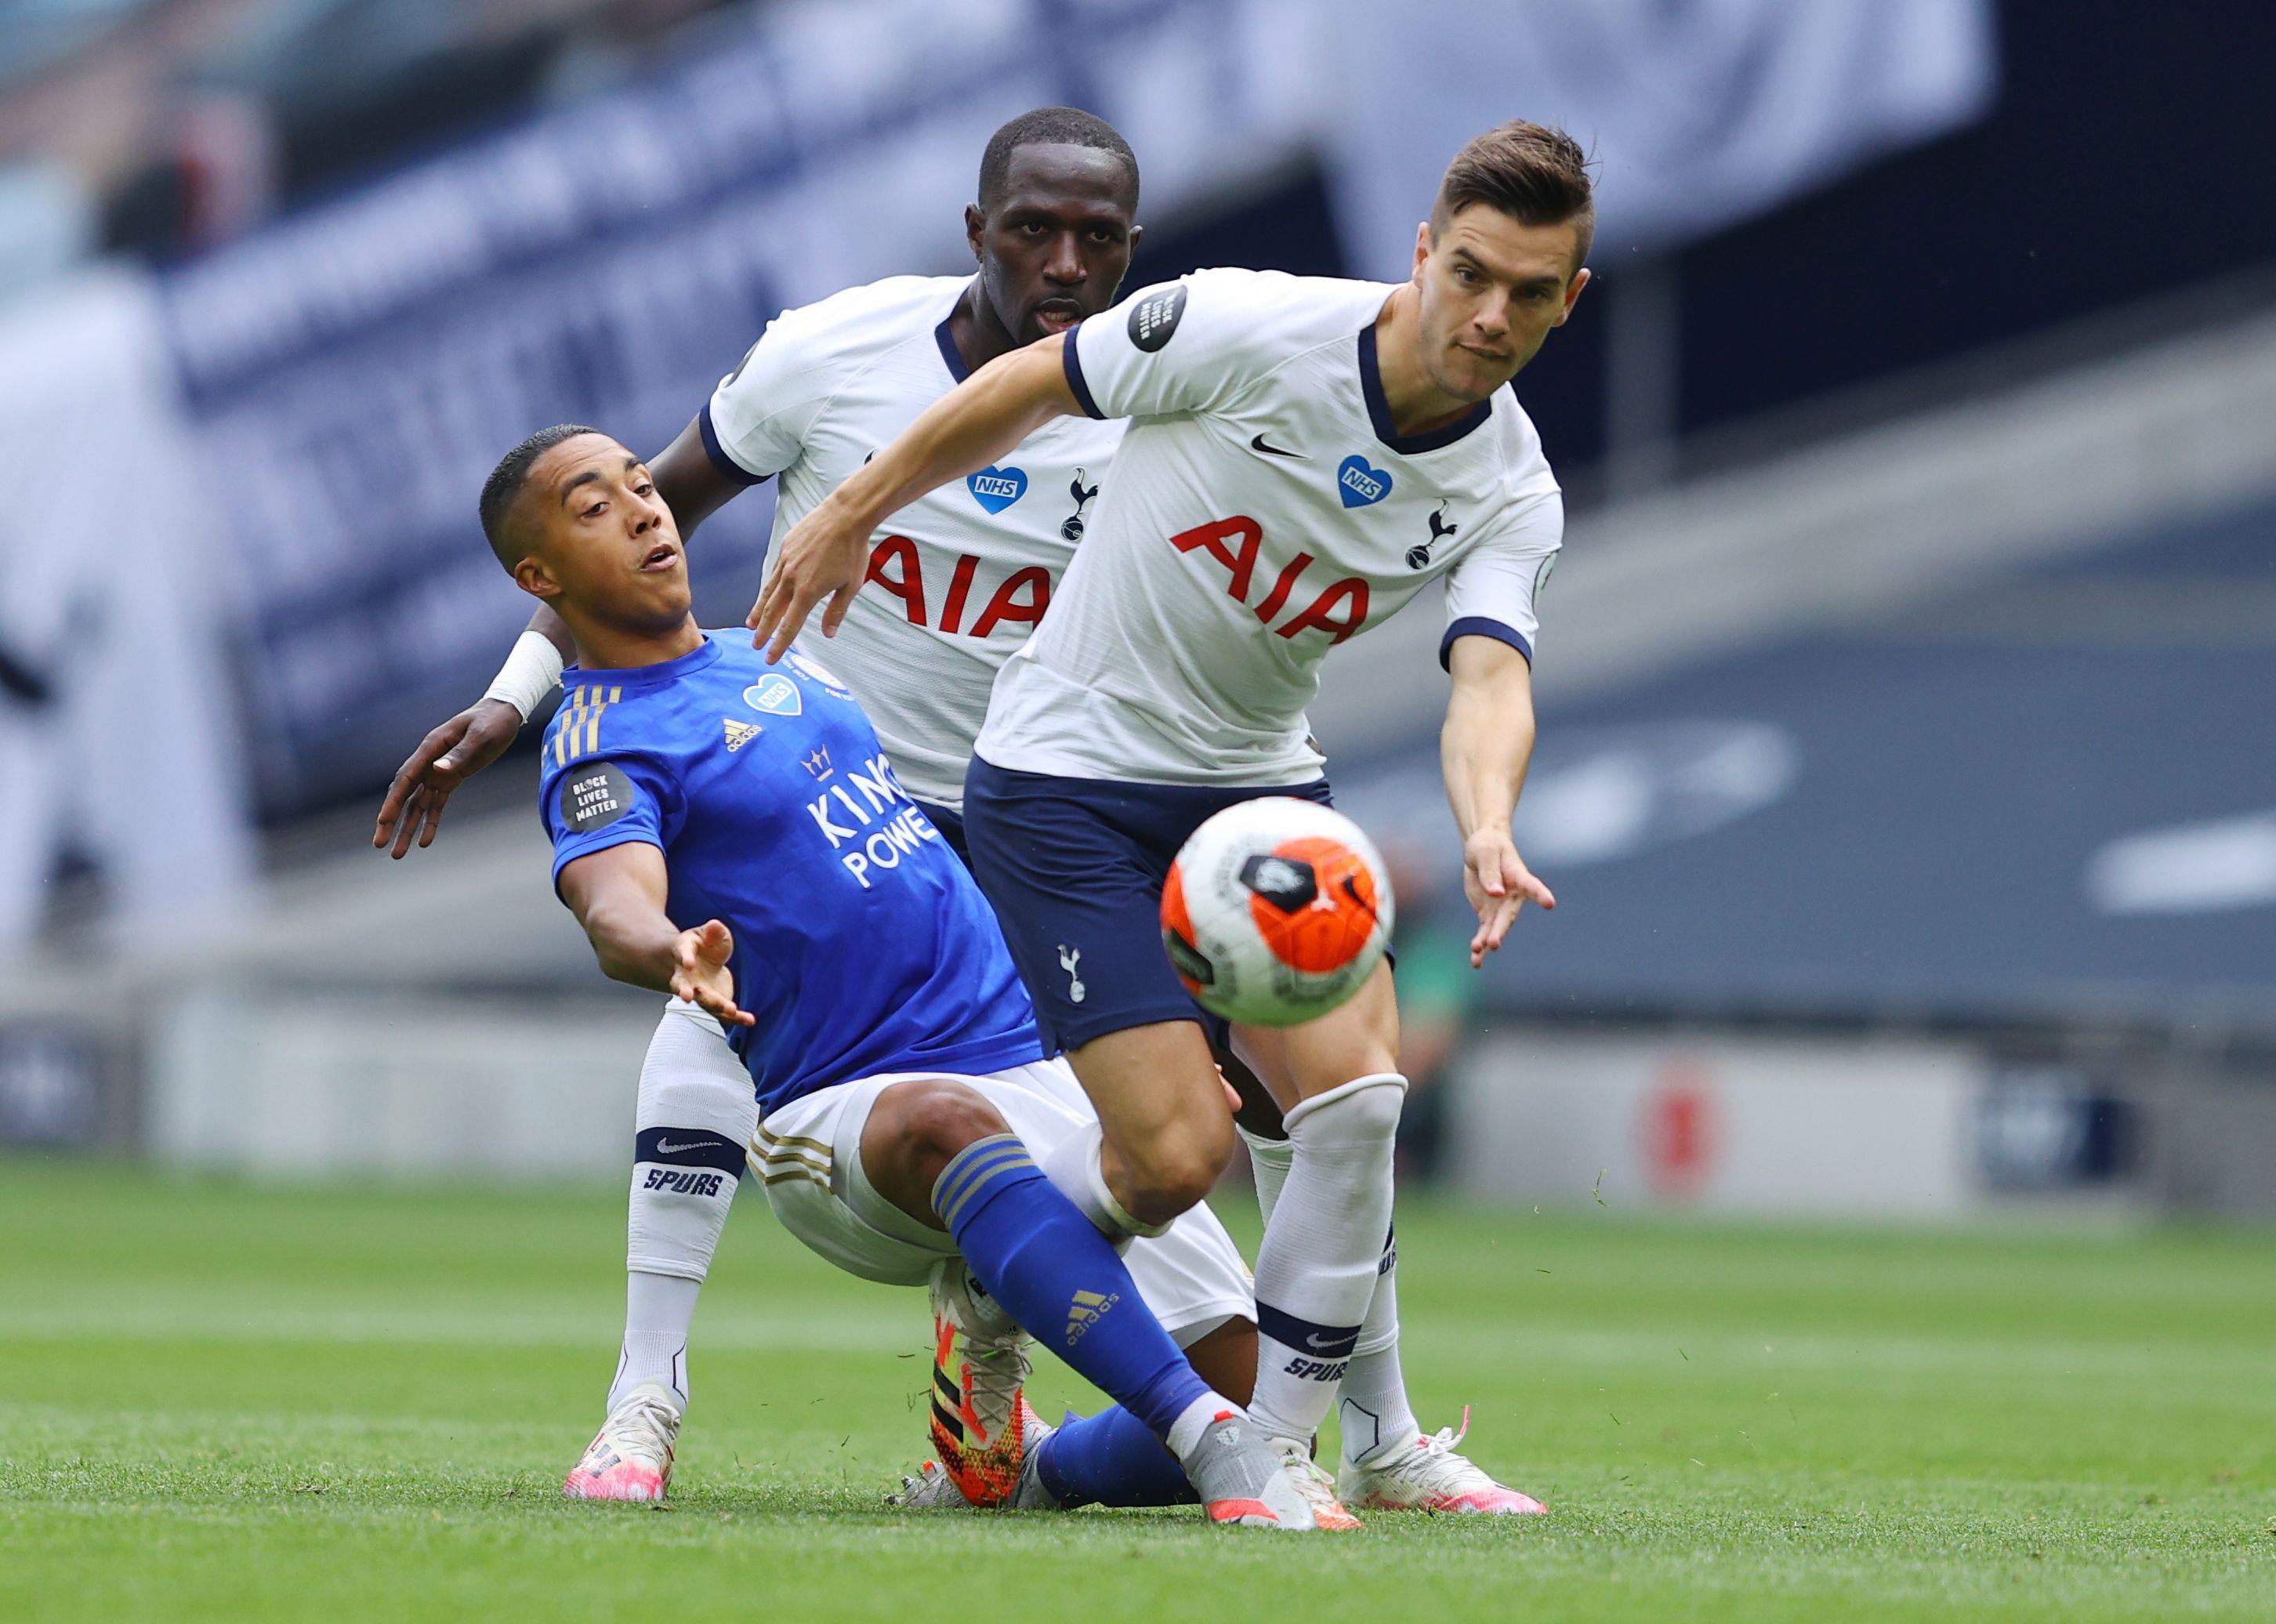 Giovanni Lo Celso juega actualmente en el Tottenham Hotspur de la Premier League inglesa (REUTERS/Richard Heathcote)